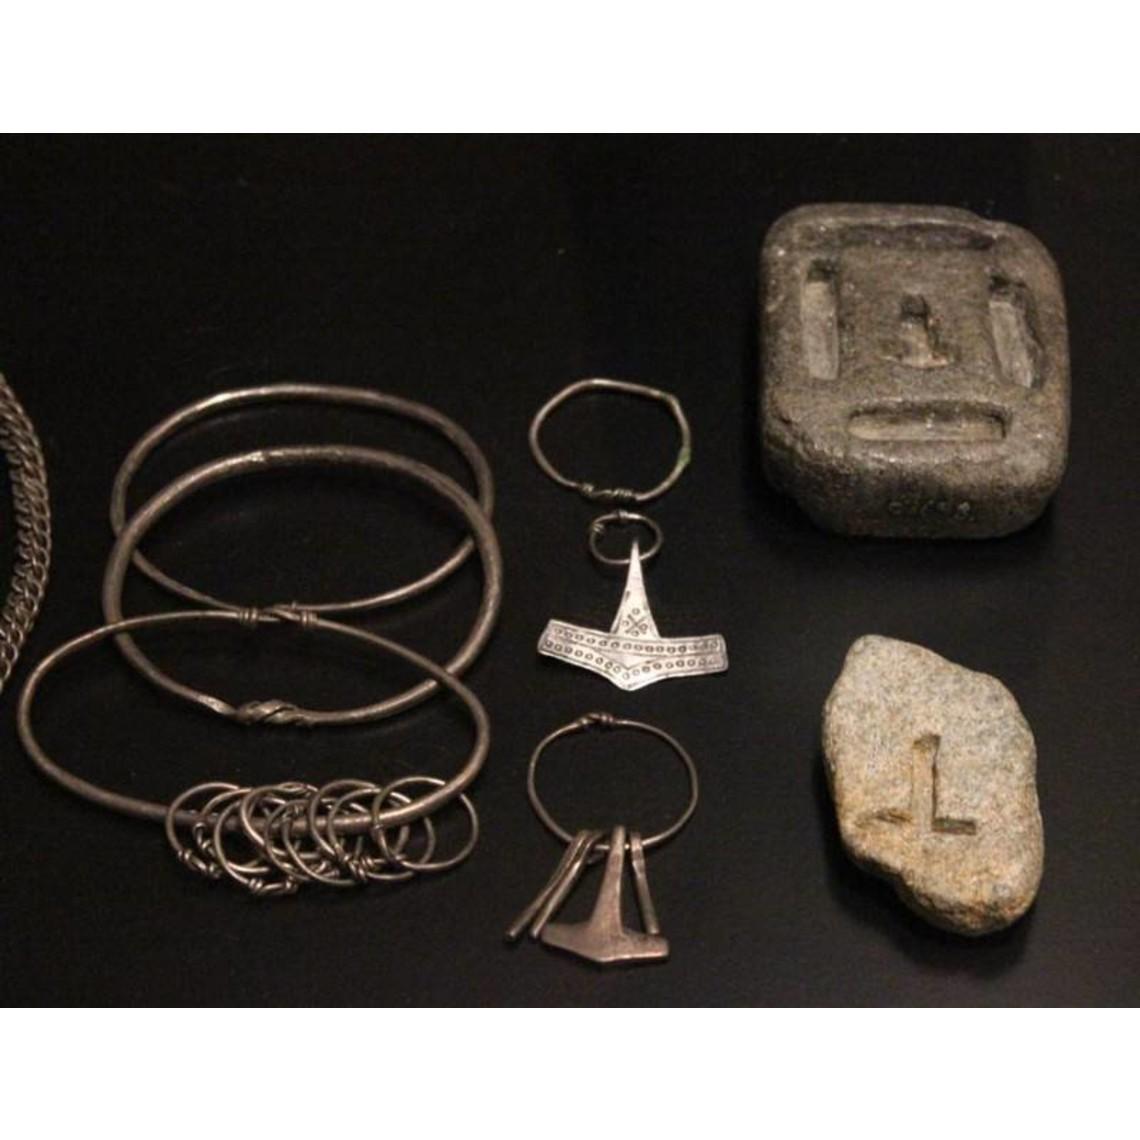 Rømersdal Thors Hammer mit Ring